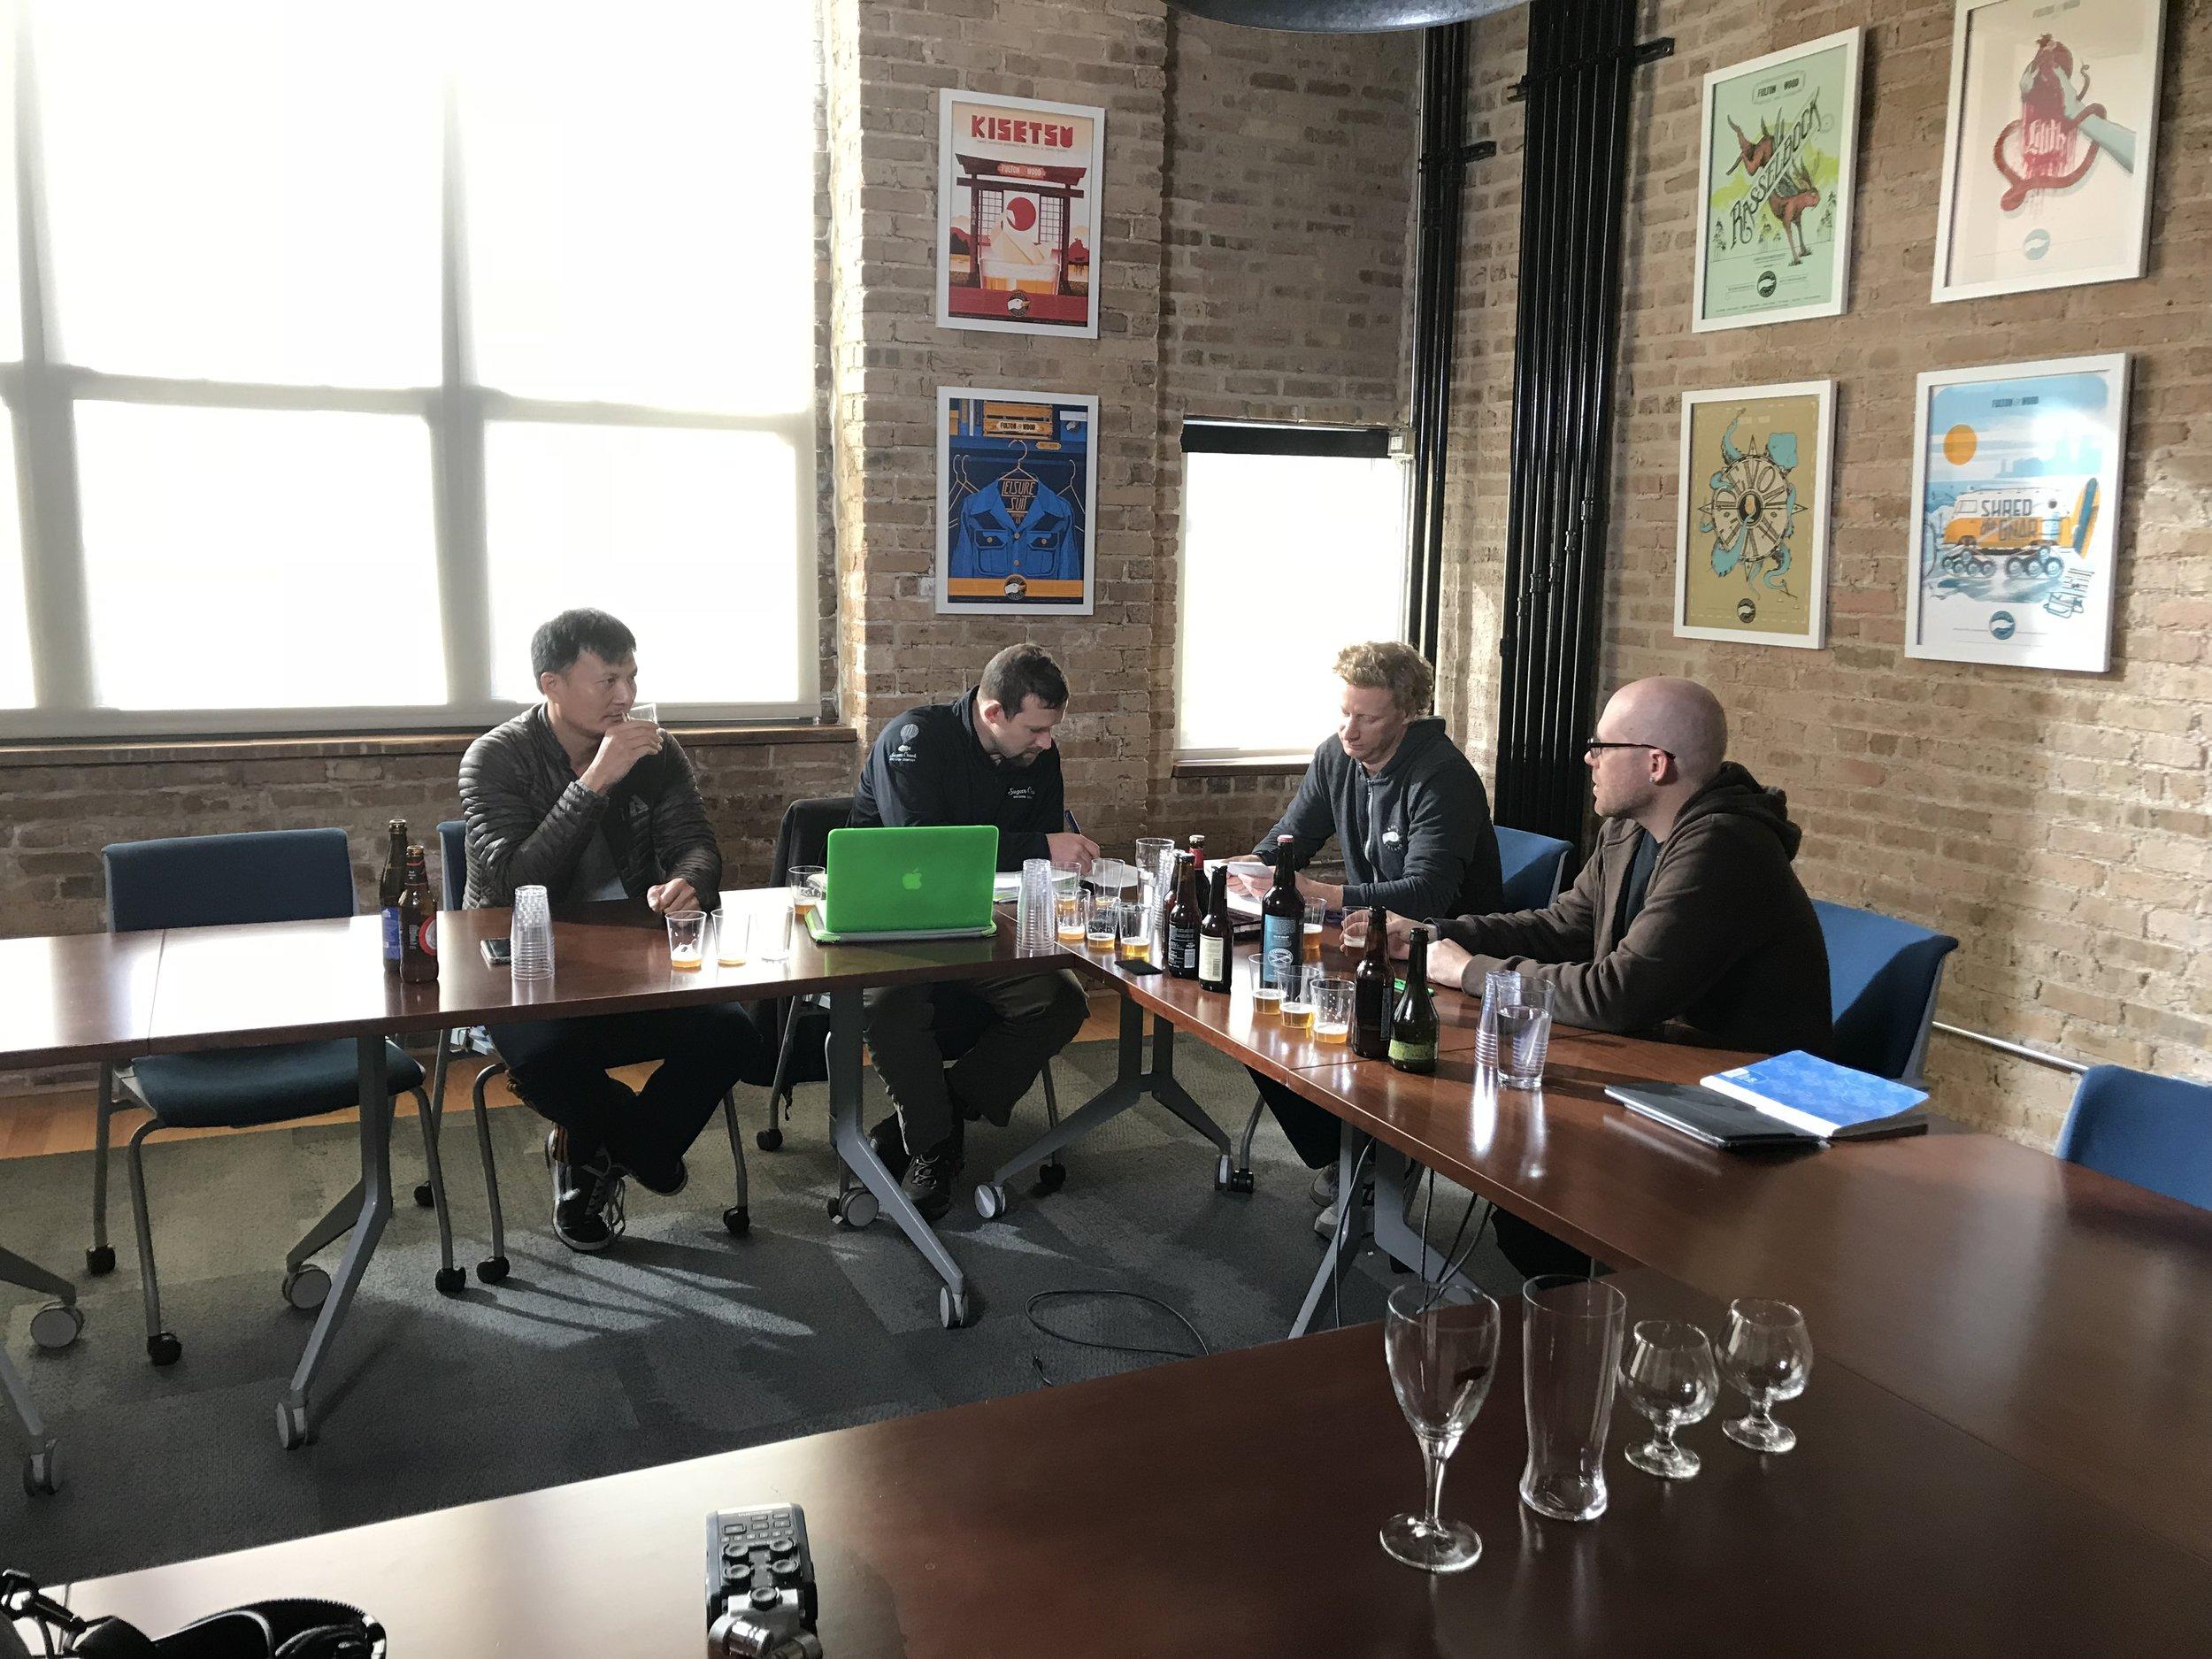 James Tai, Joe Vogelbacher, Ryan Daley, and Gavin Harper prepare for the grueling Master Cicerone exam.